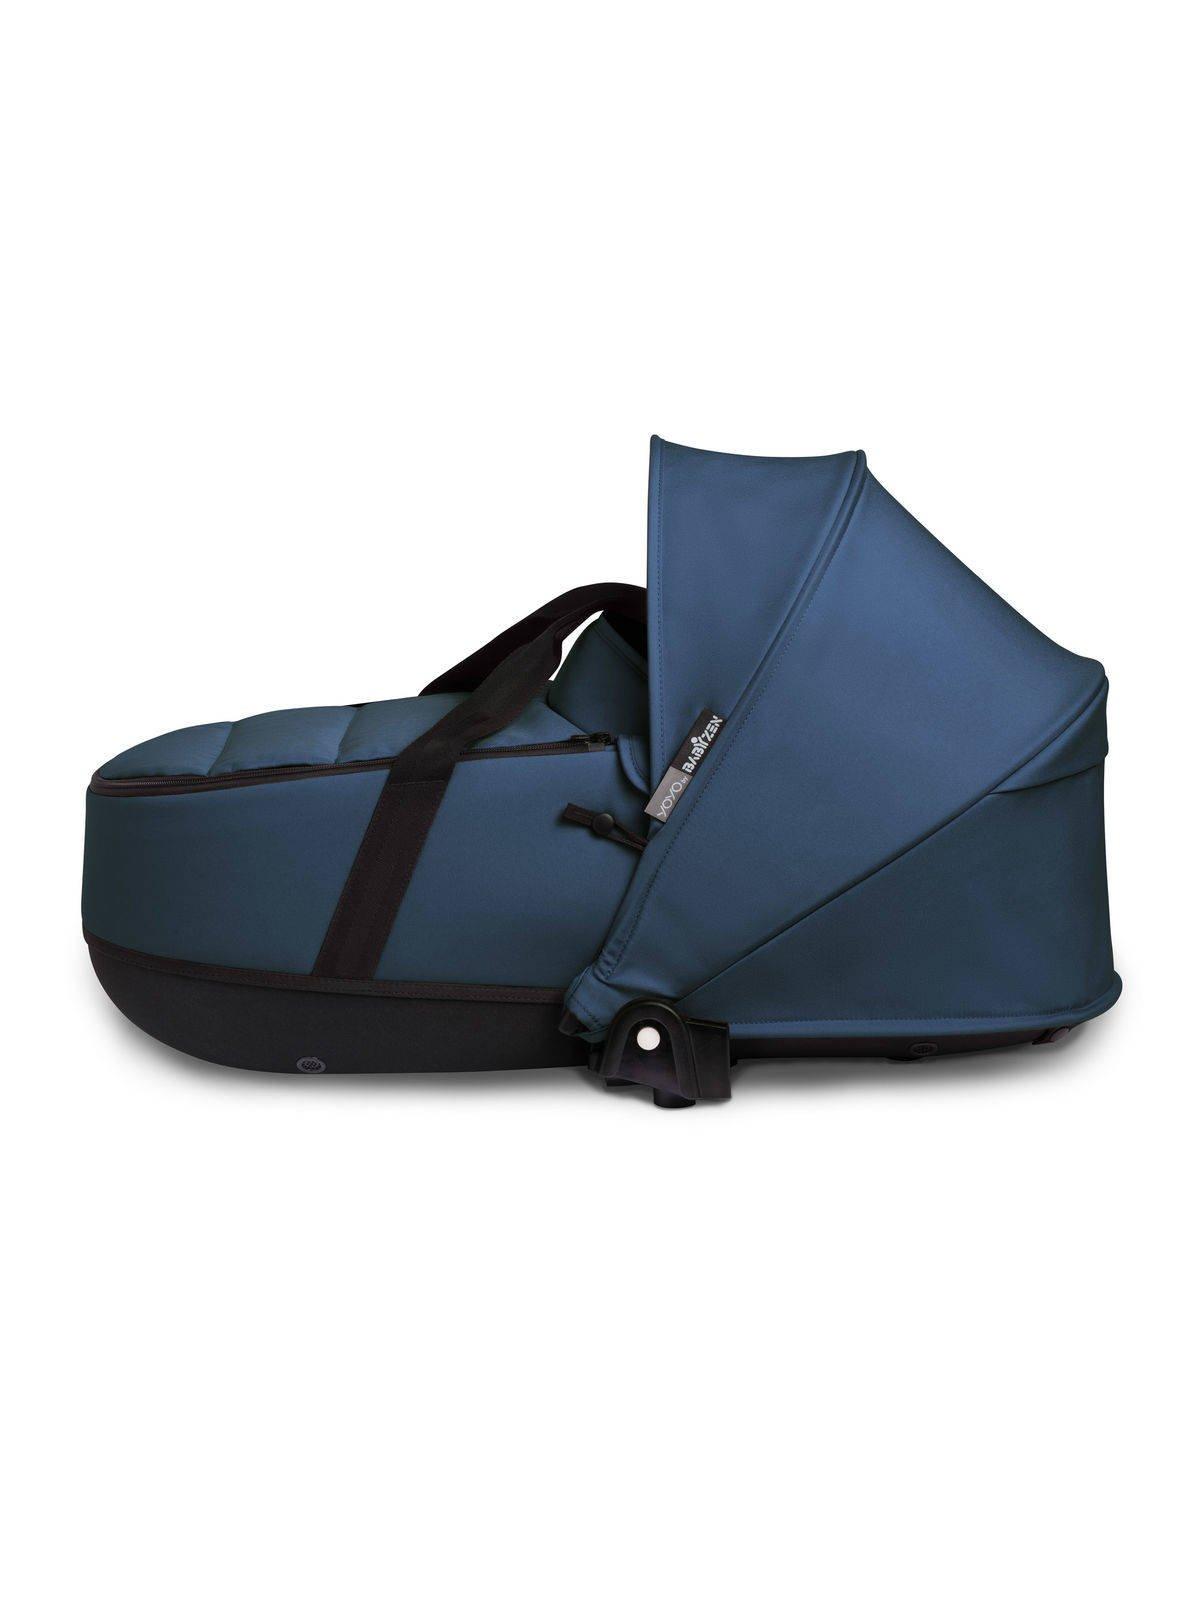 BABYZEN YOYO² - zestaw czarna rama + gondola - Navy Blue